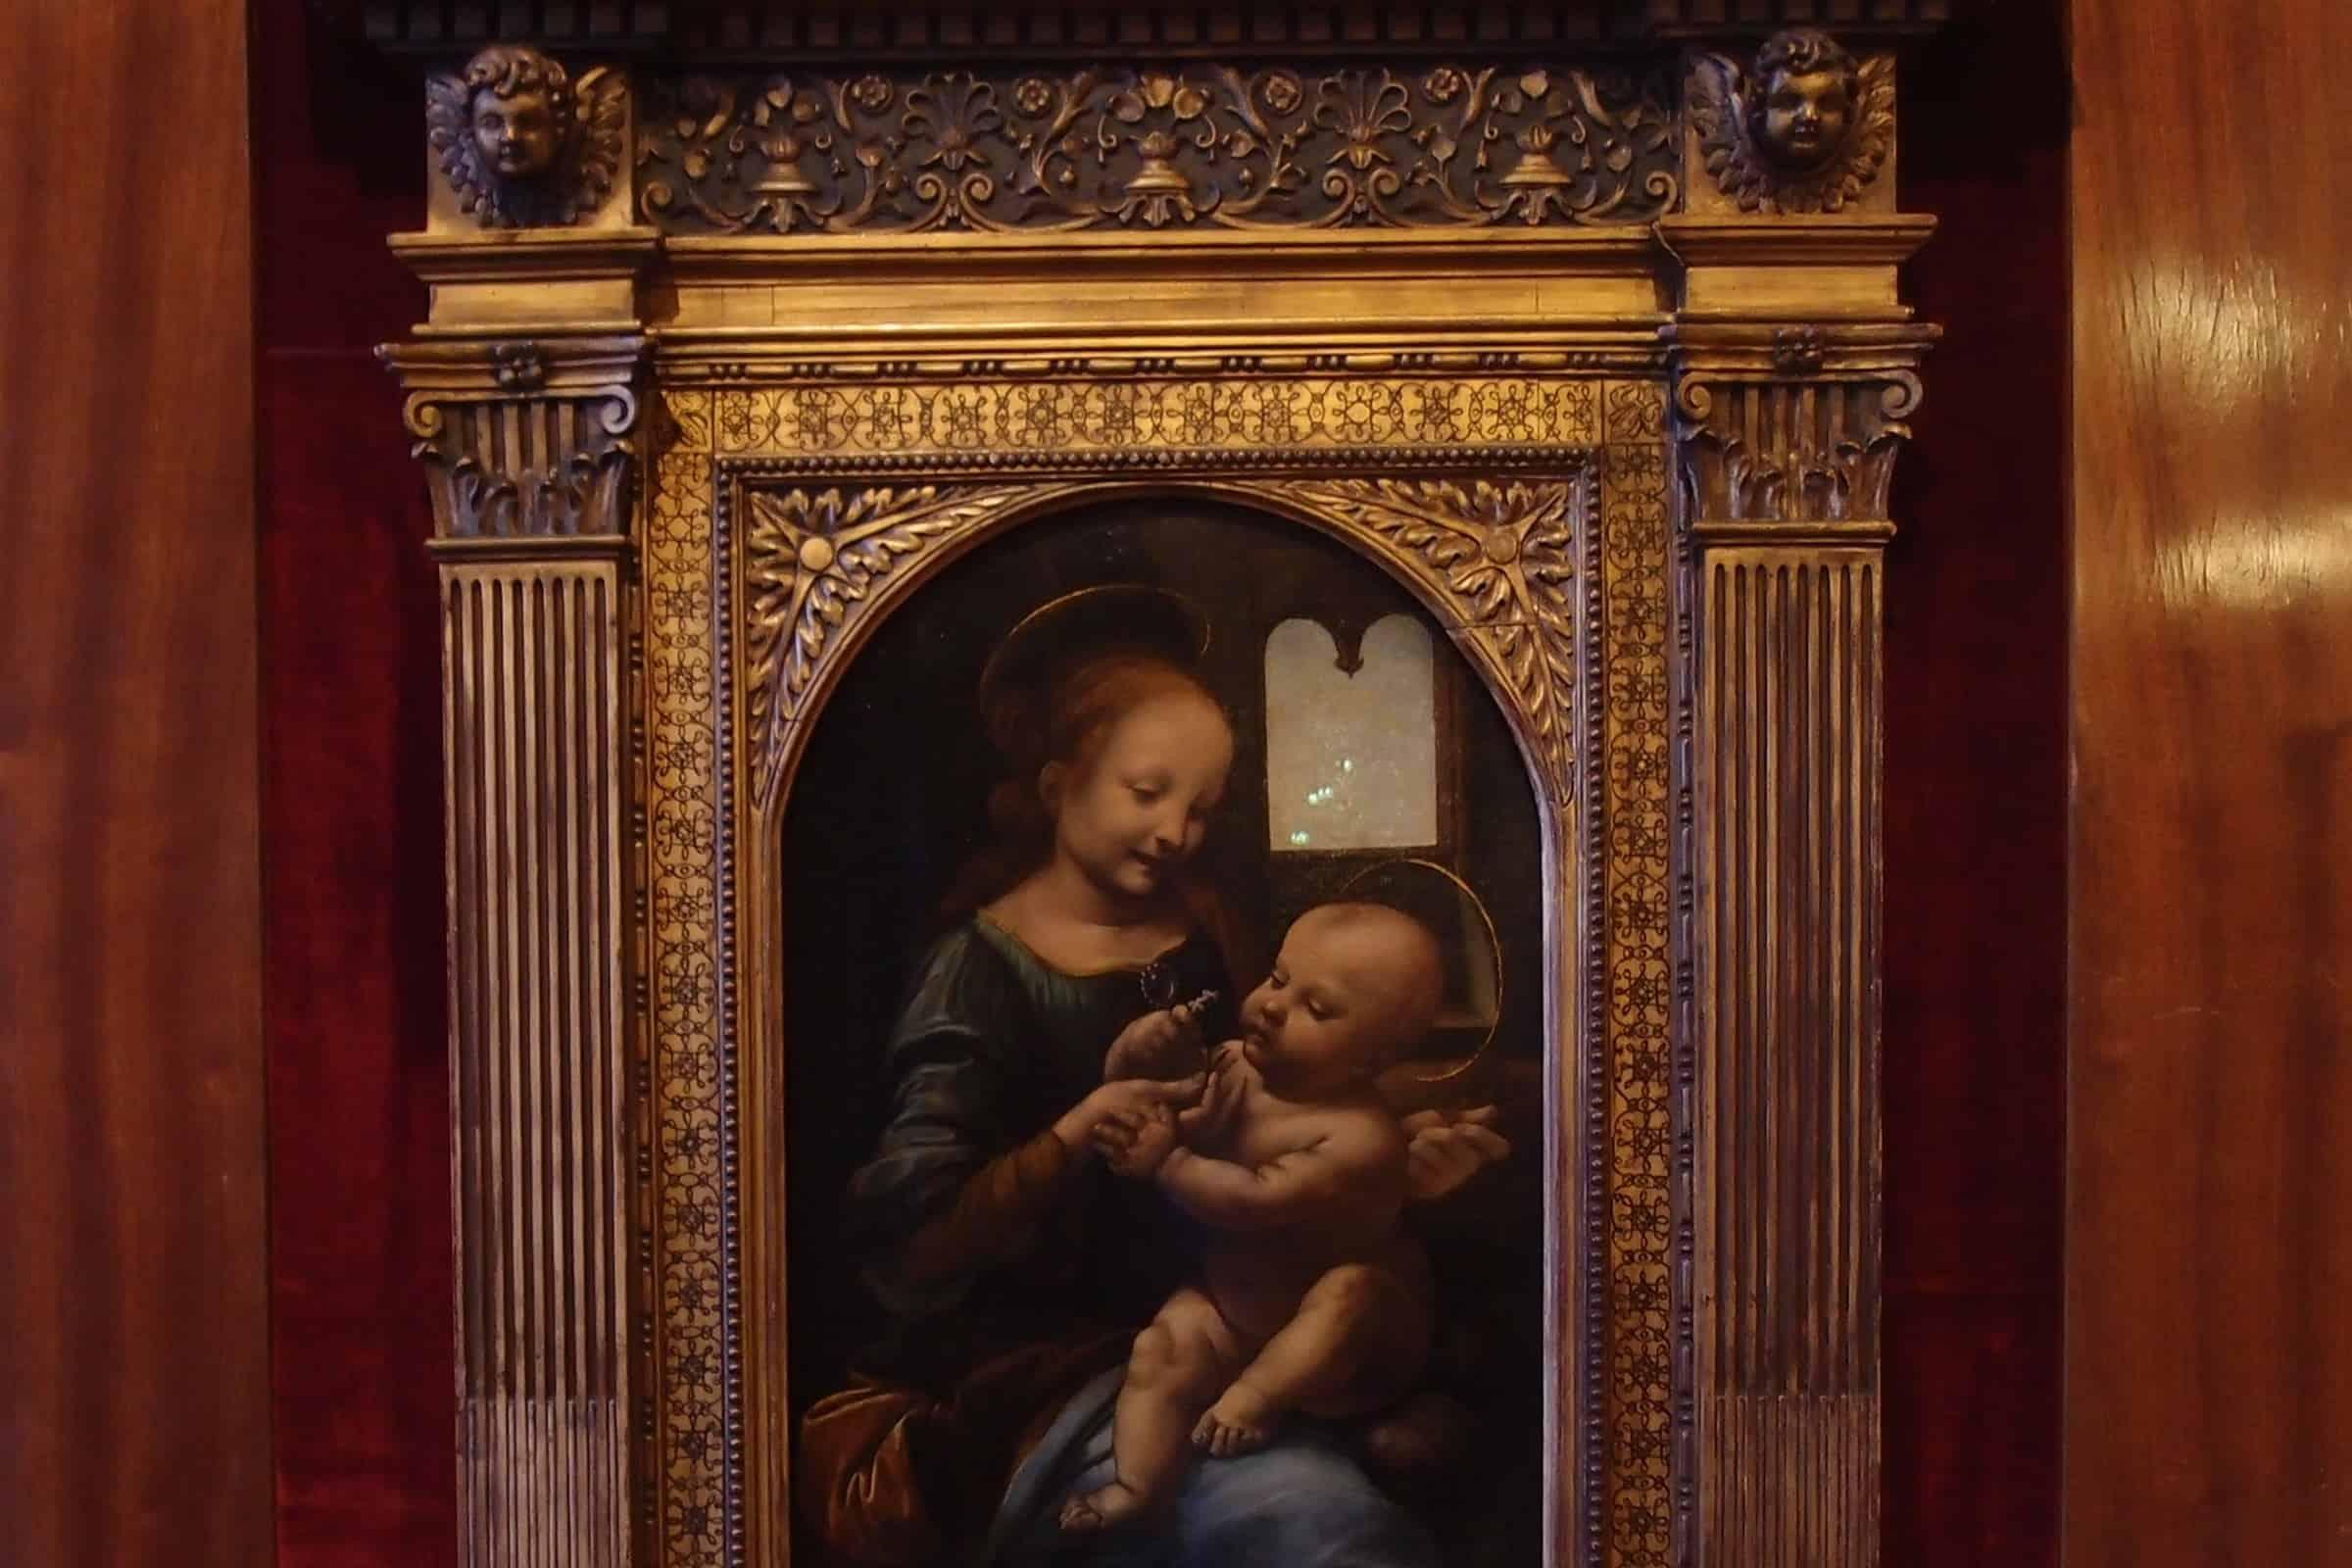 Da Vinci: Madonna Benois. Courtesy of The State Hermitage Museum